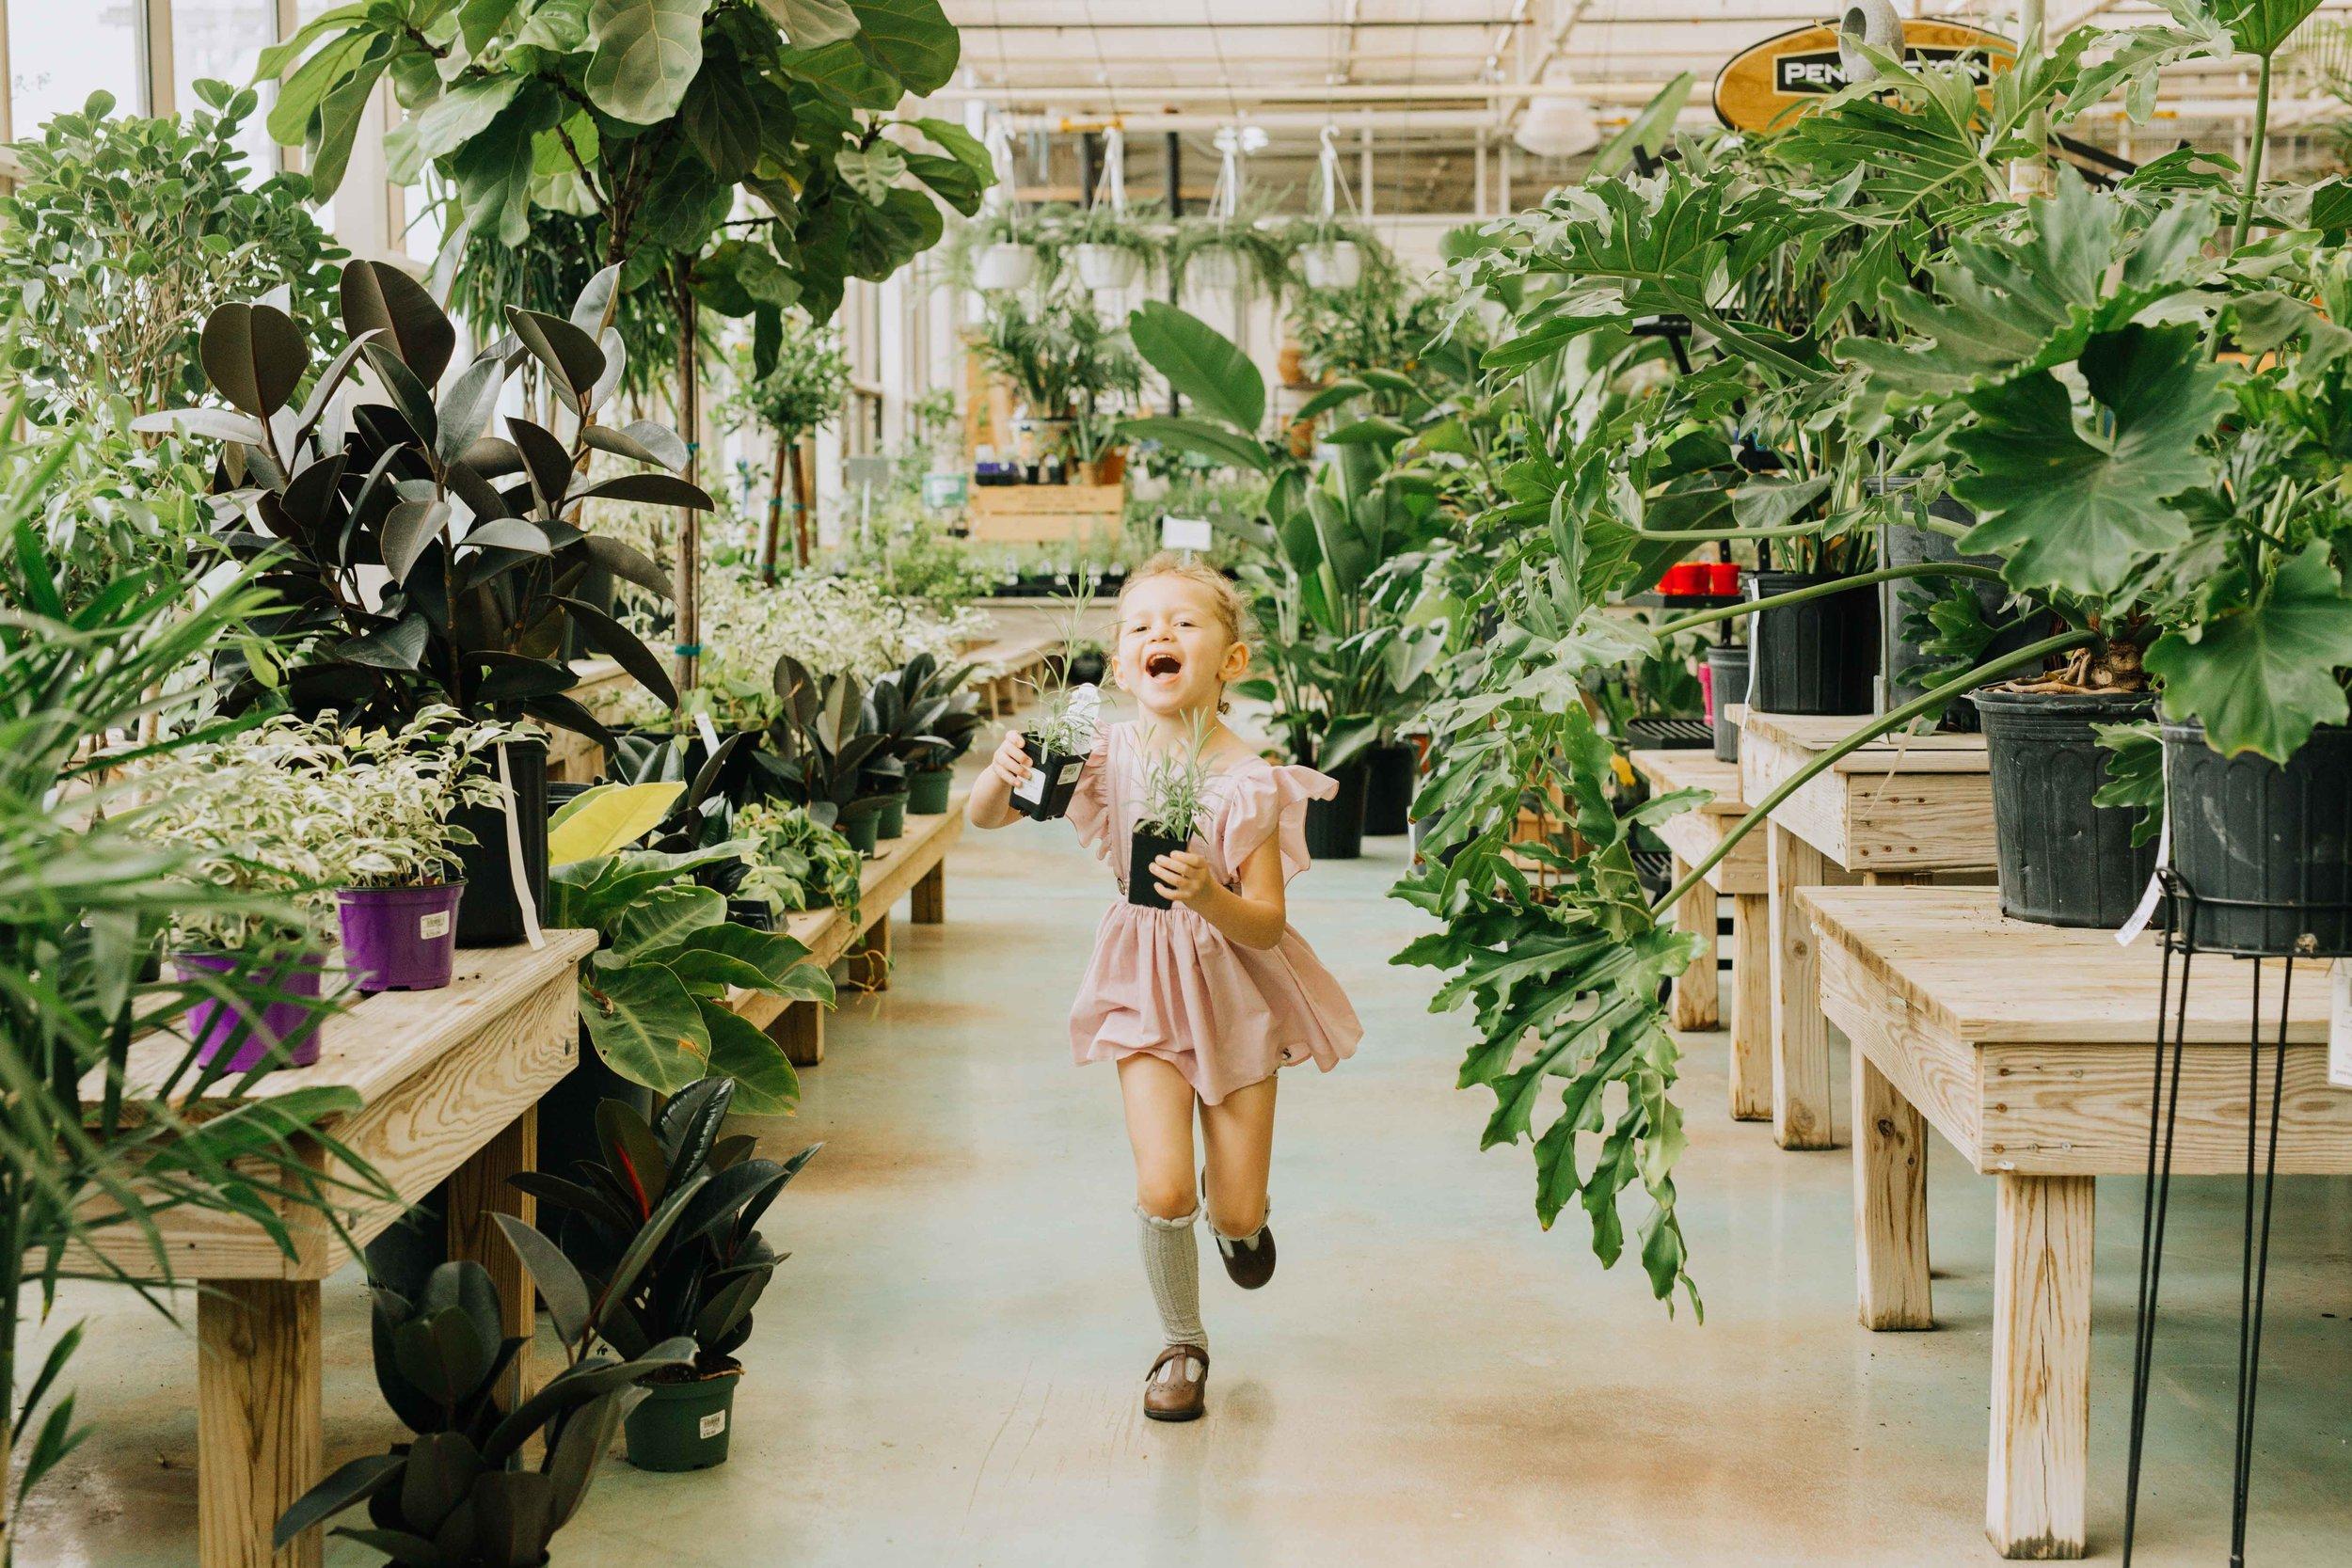 Merrifield-garden-greenhouse-indoor-Jacqueline-Waters-Photography-Red-dress-family- (206).jpg